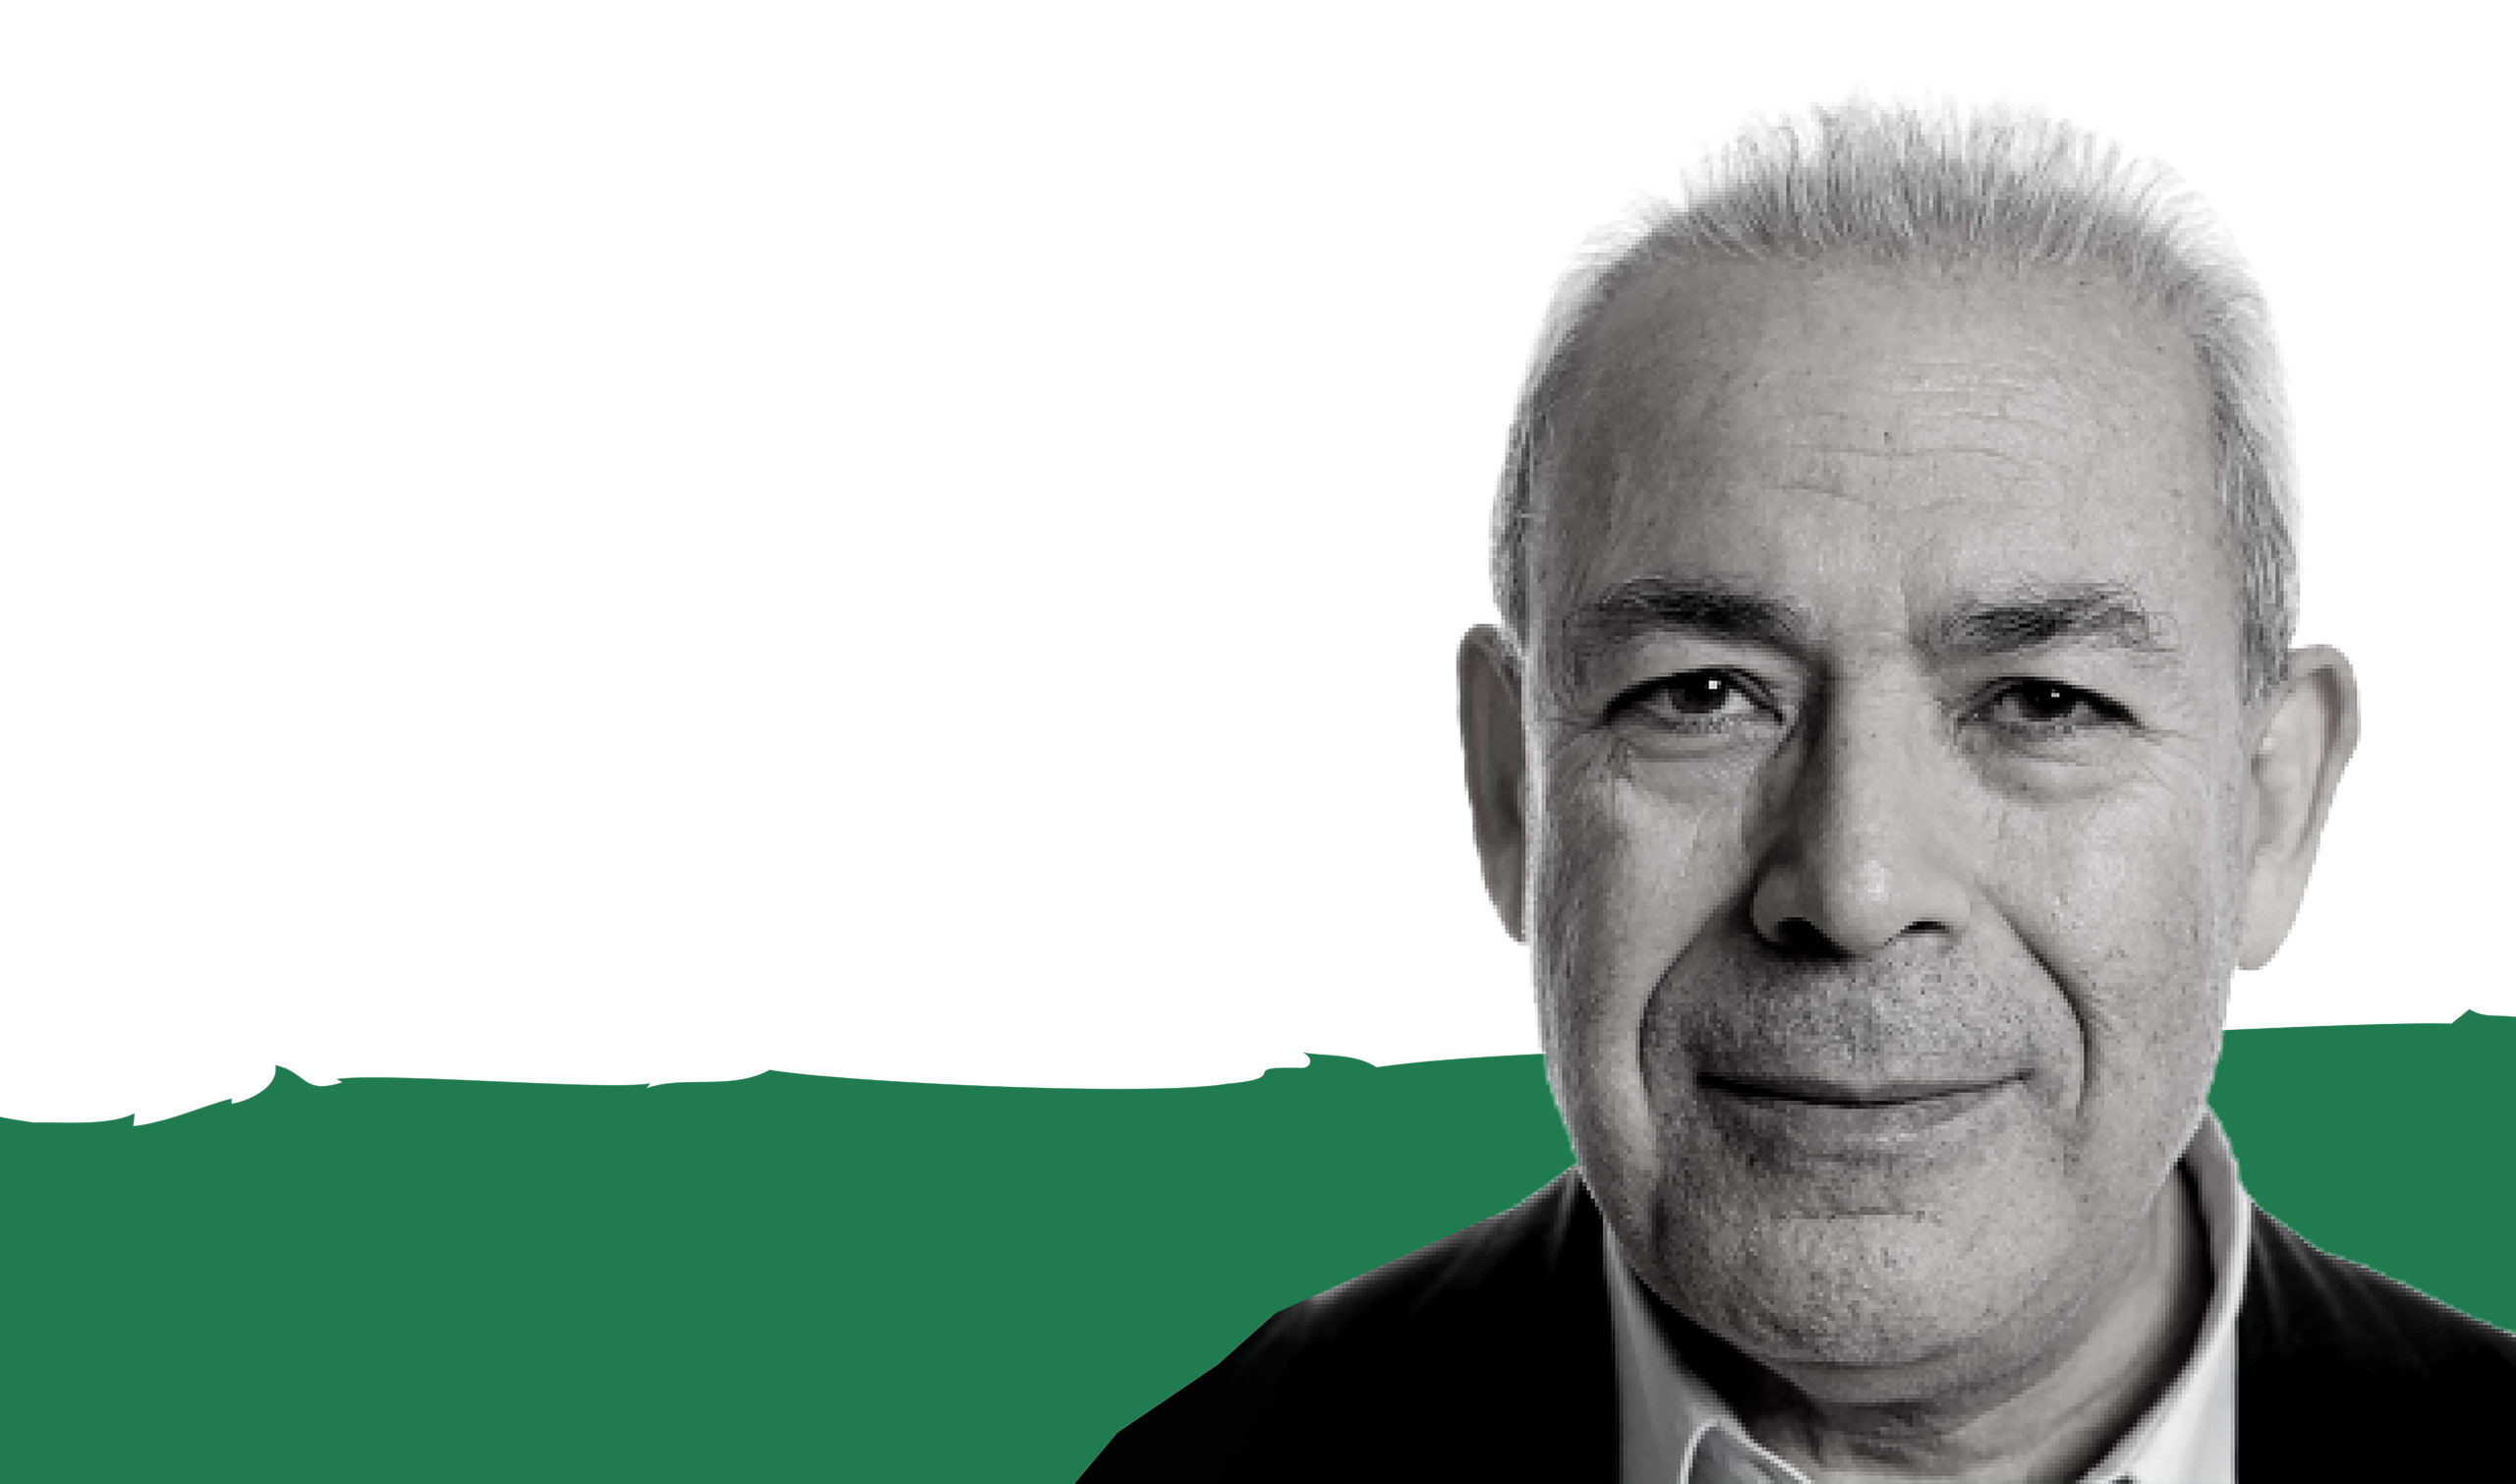 المفكر والمعارض السوري برهان غليون